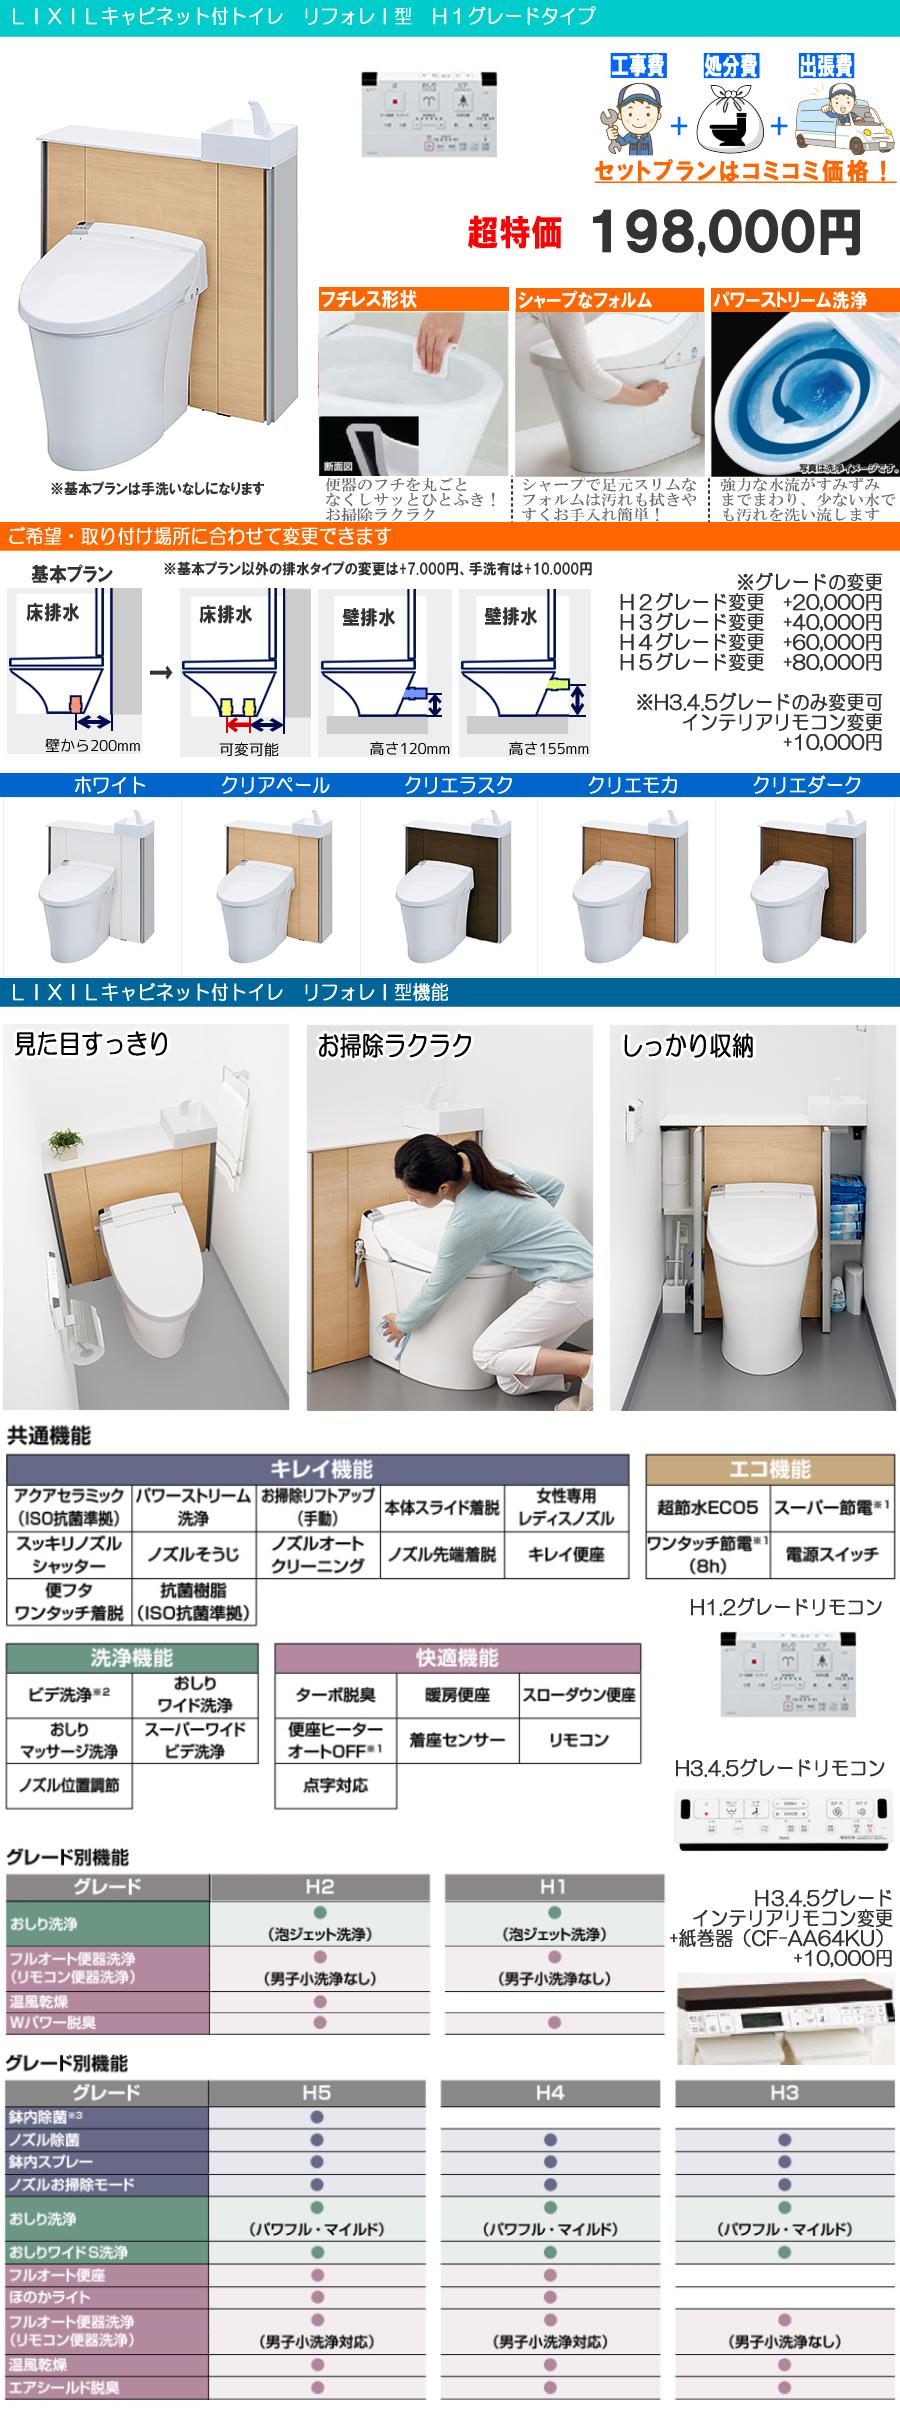 TOTOトイレ交換リフォーム